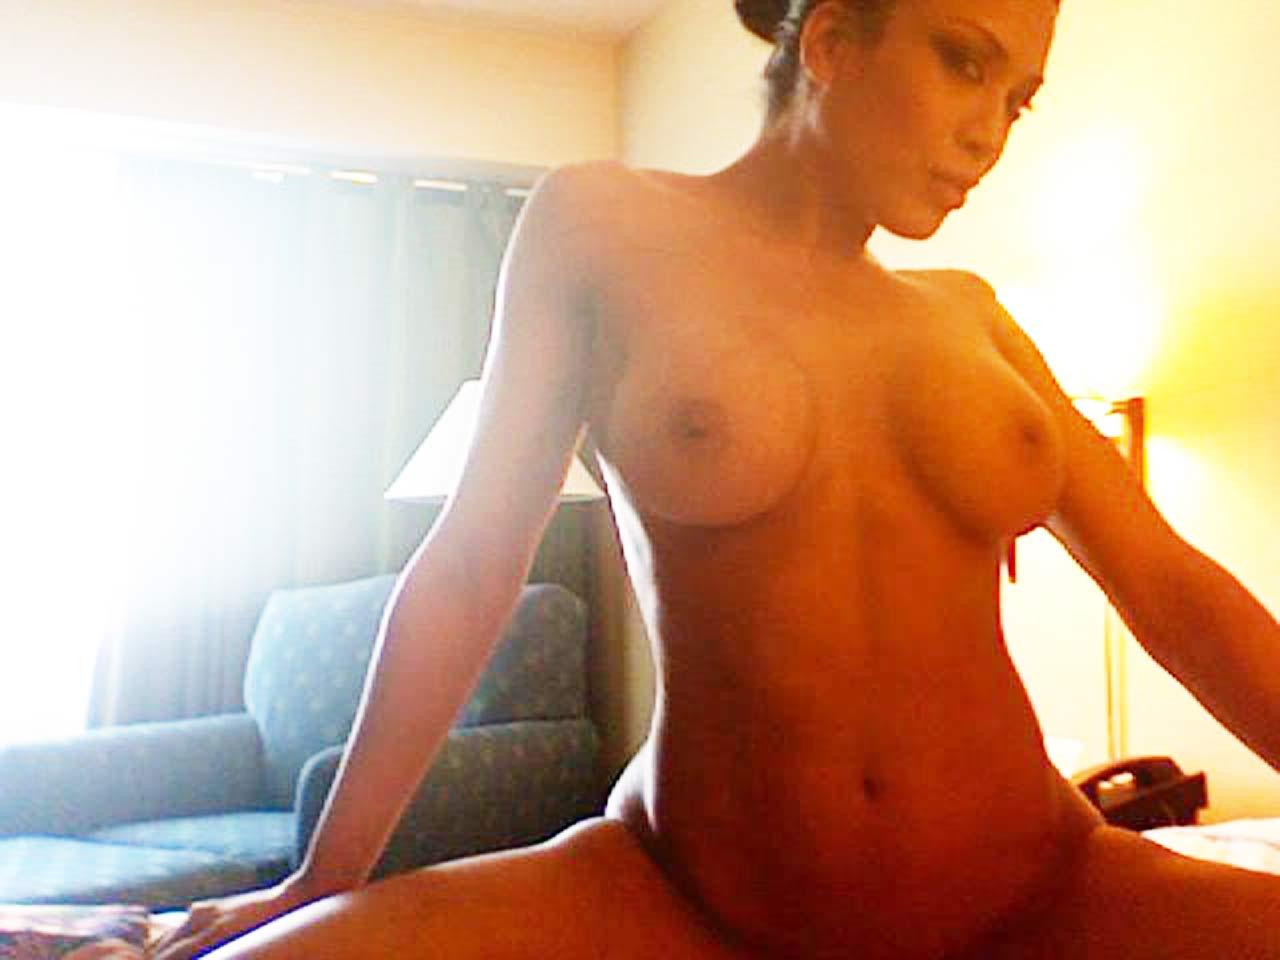 Wwe Melina Perez Nude Private Premium Snapchat